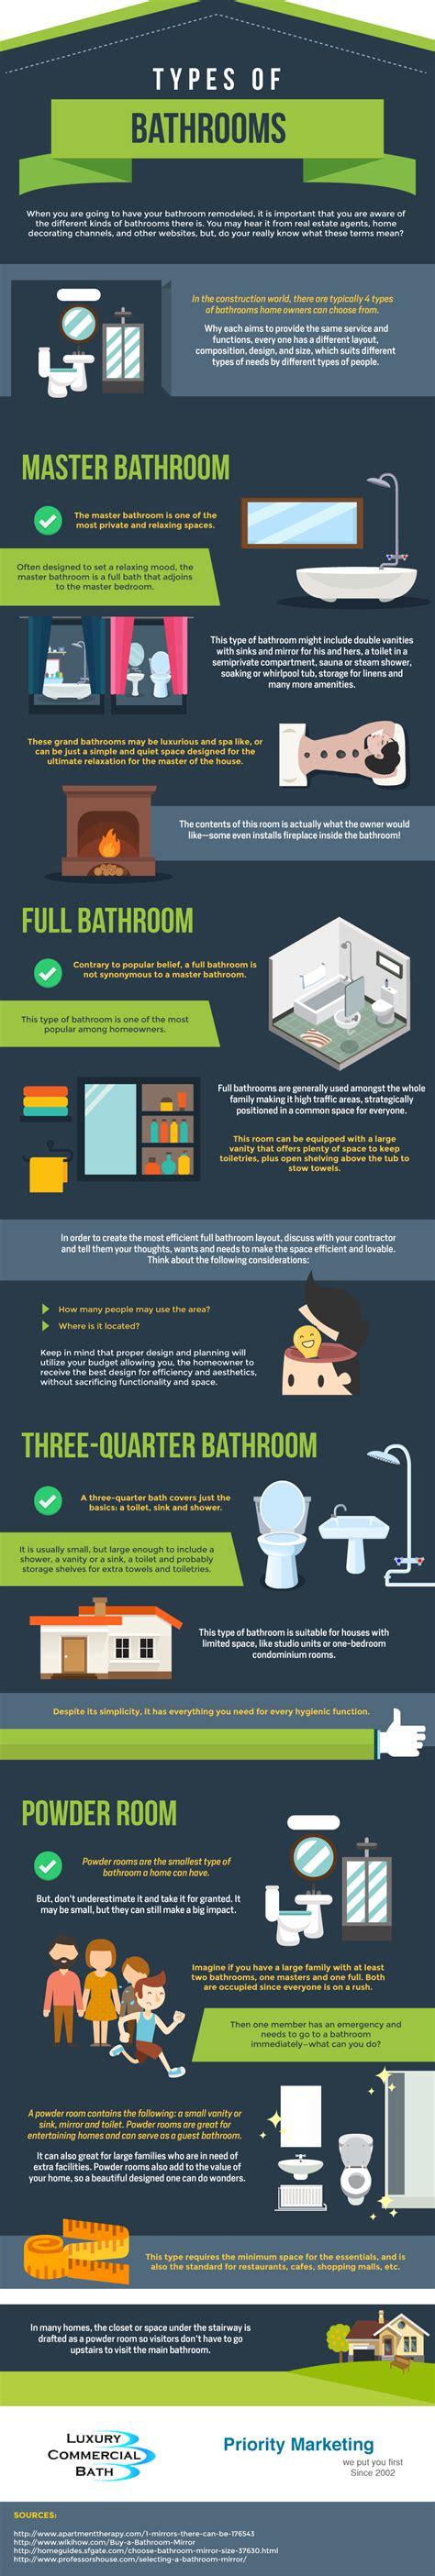 types of bathrooms types of bathrooms ieyenews